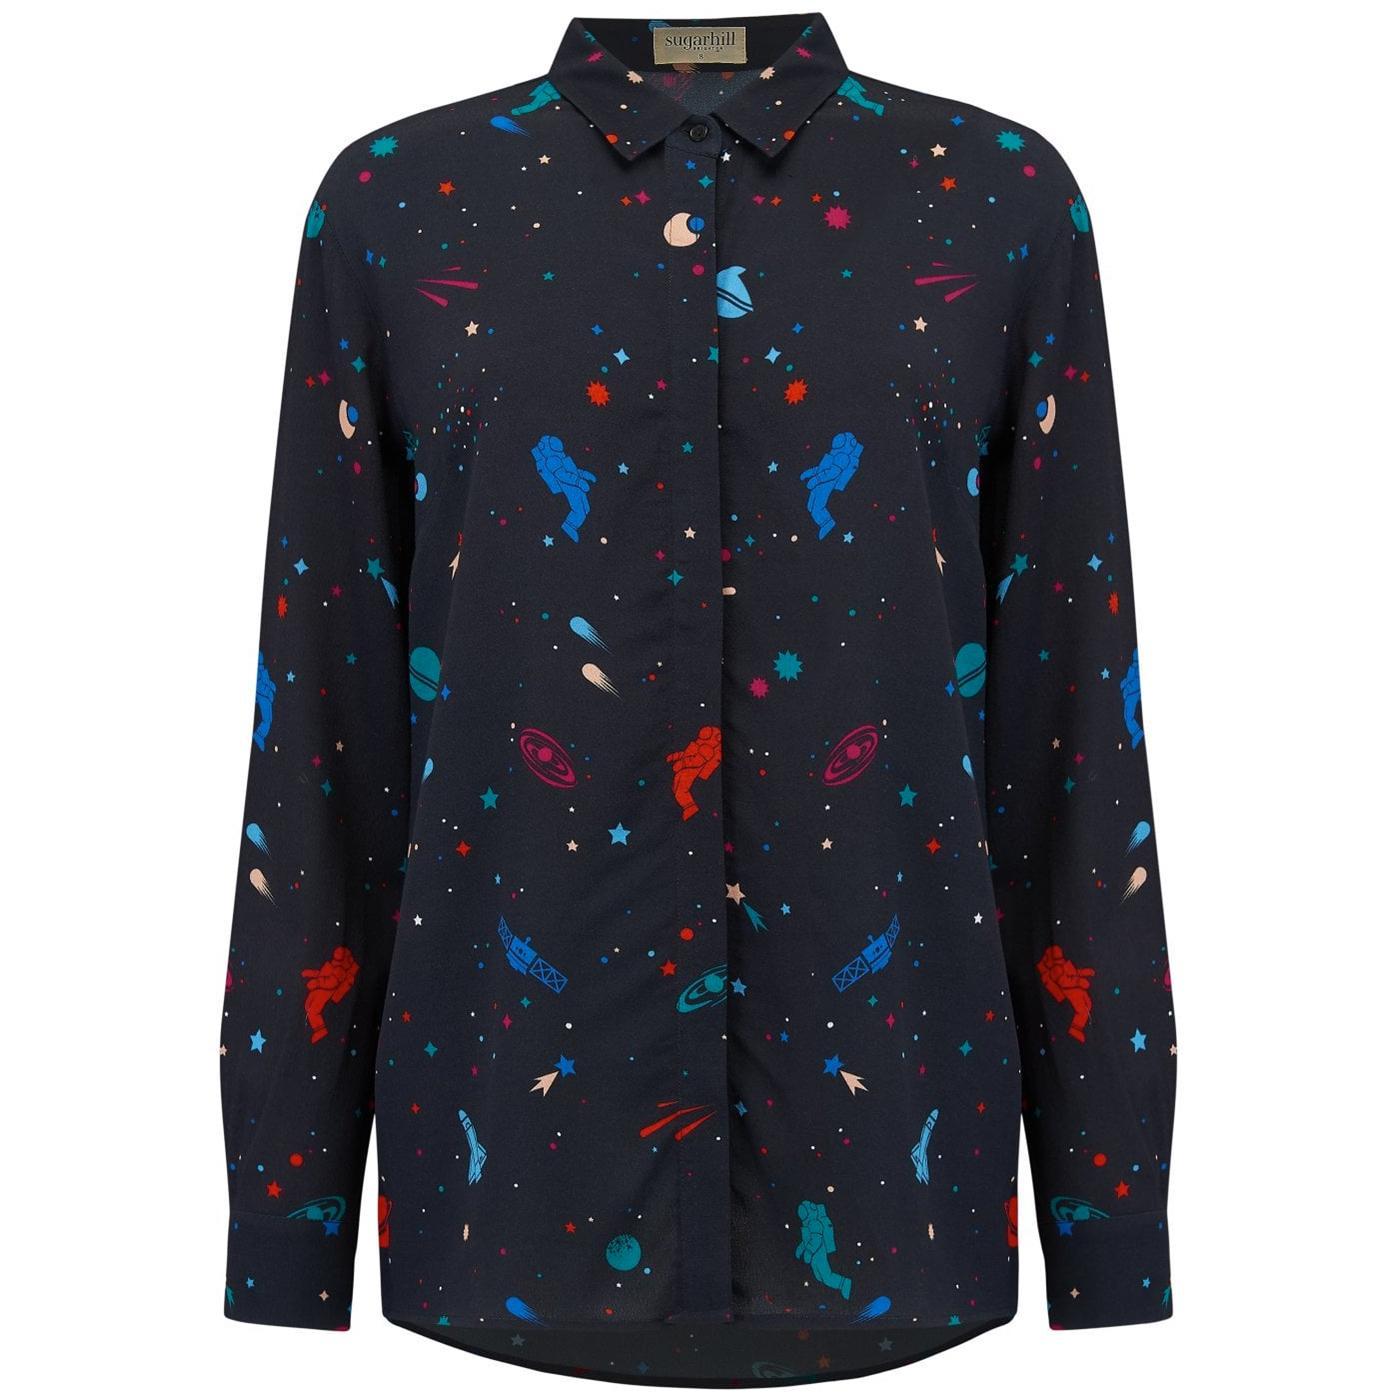 Joy SUGARHILL BRIGHTON Cosmic Retro Space Shirt